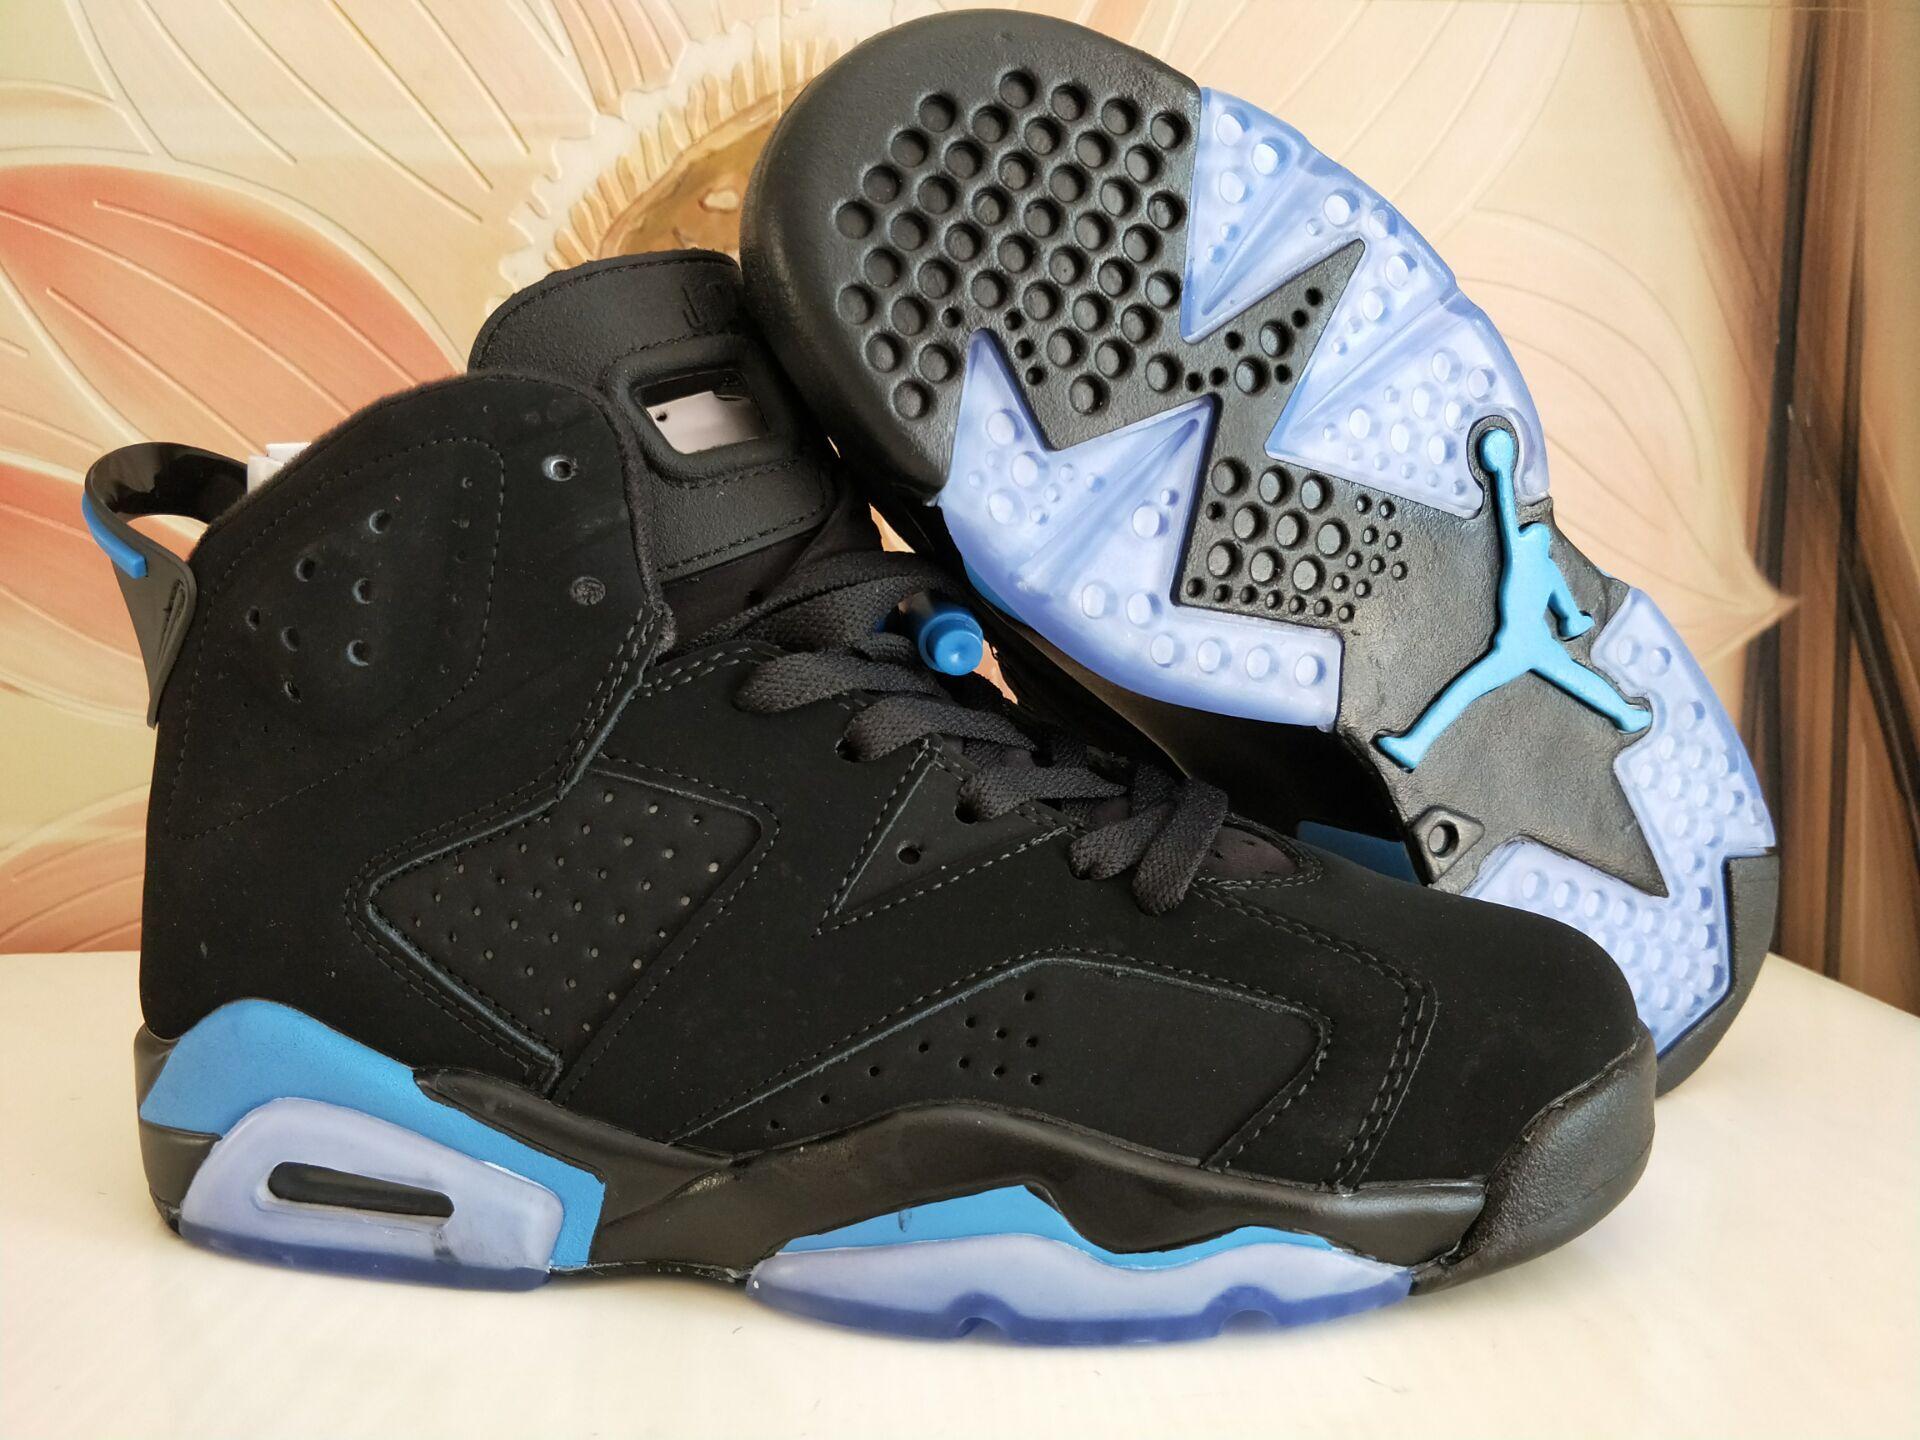 e378e2d5ab2576 Prev Nike Air Jordan VI 6 Retro Unisex Basketball Shoes Black White Blue  543390. Zoom